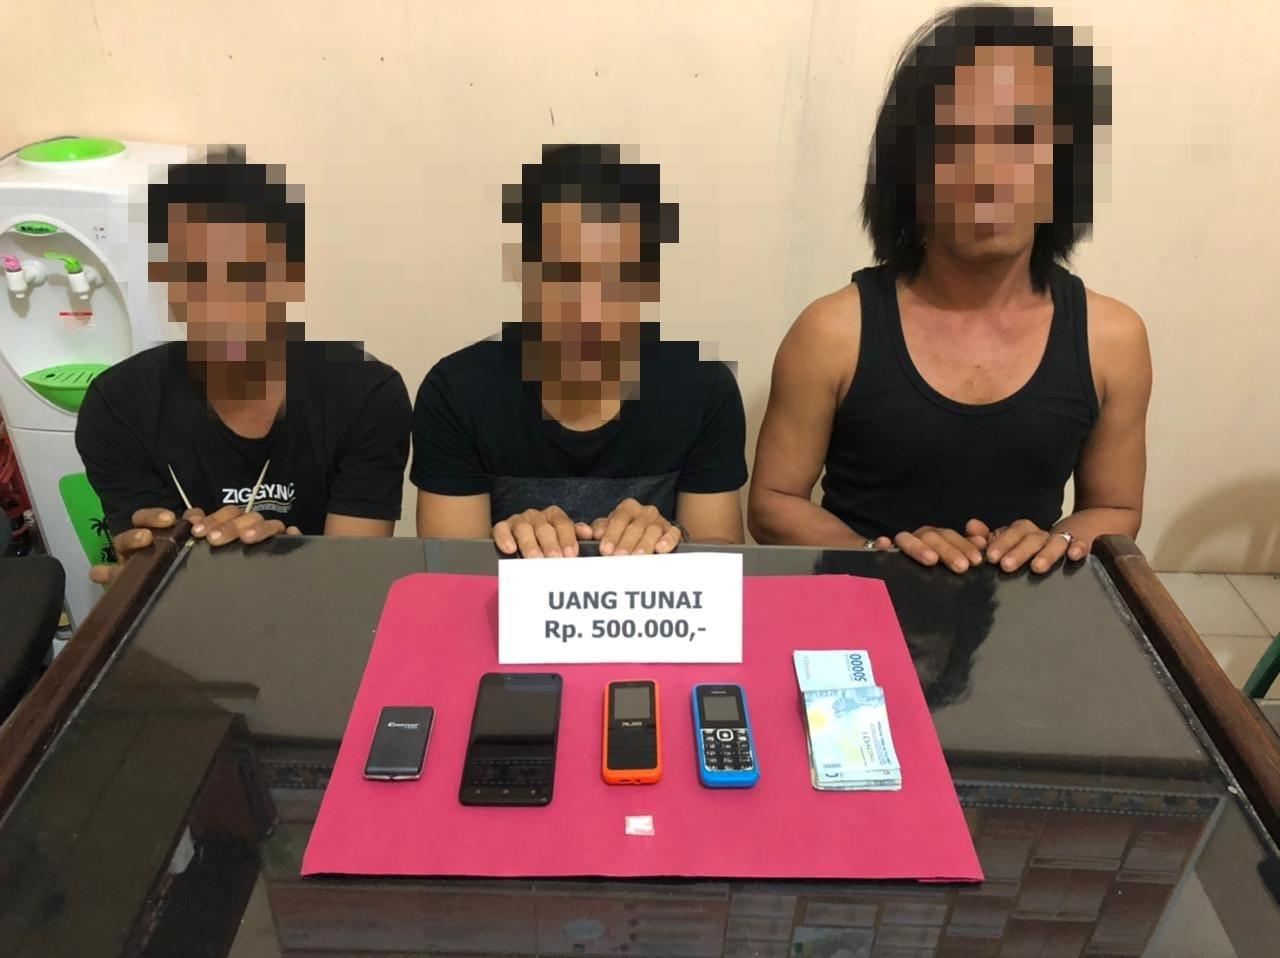 Tiga Pelaku Narkoba Diringkus, Satu Masih Masih DPO